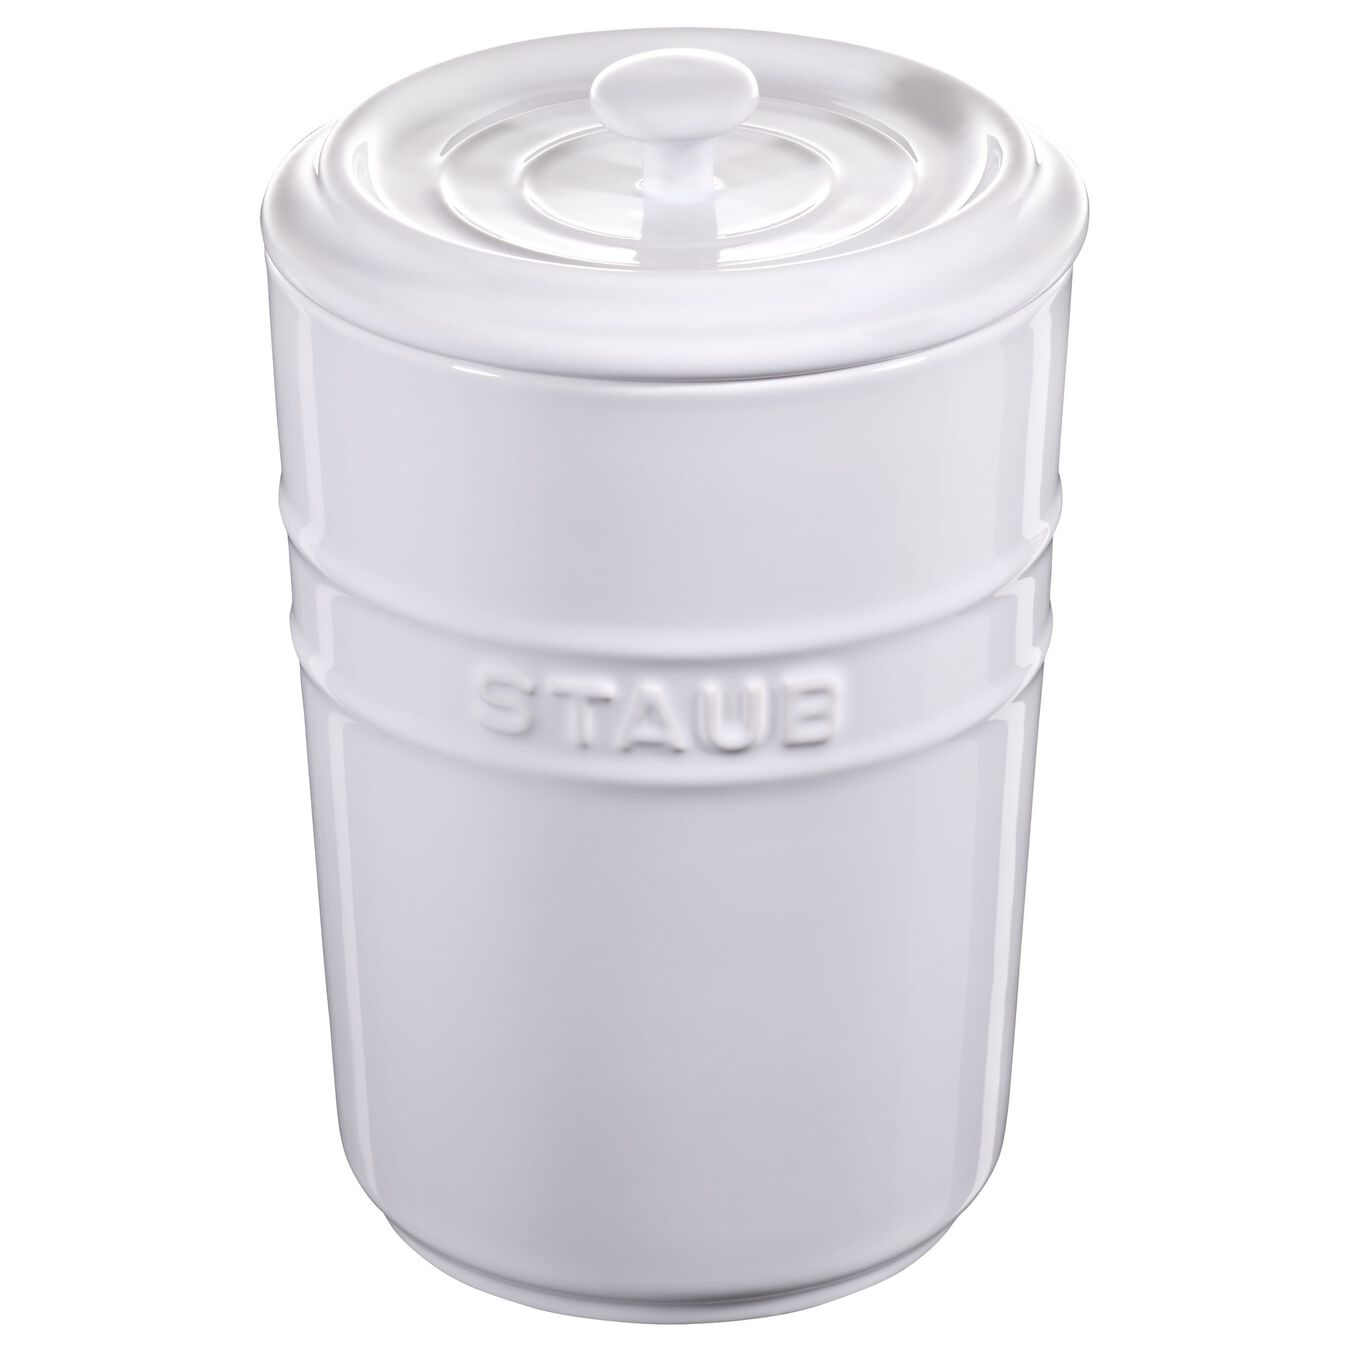 1.5 l Ceramic Storage pot, Pure-White,,large 1